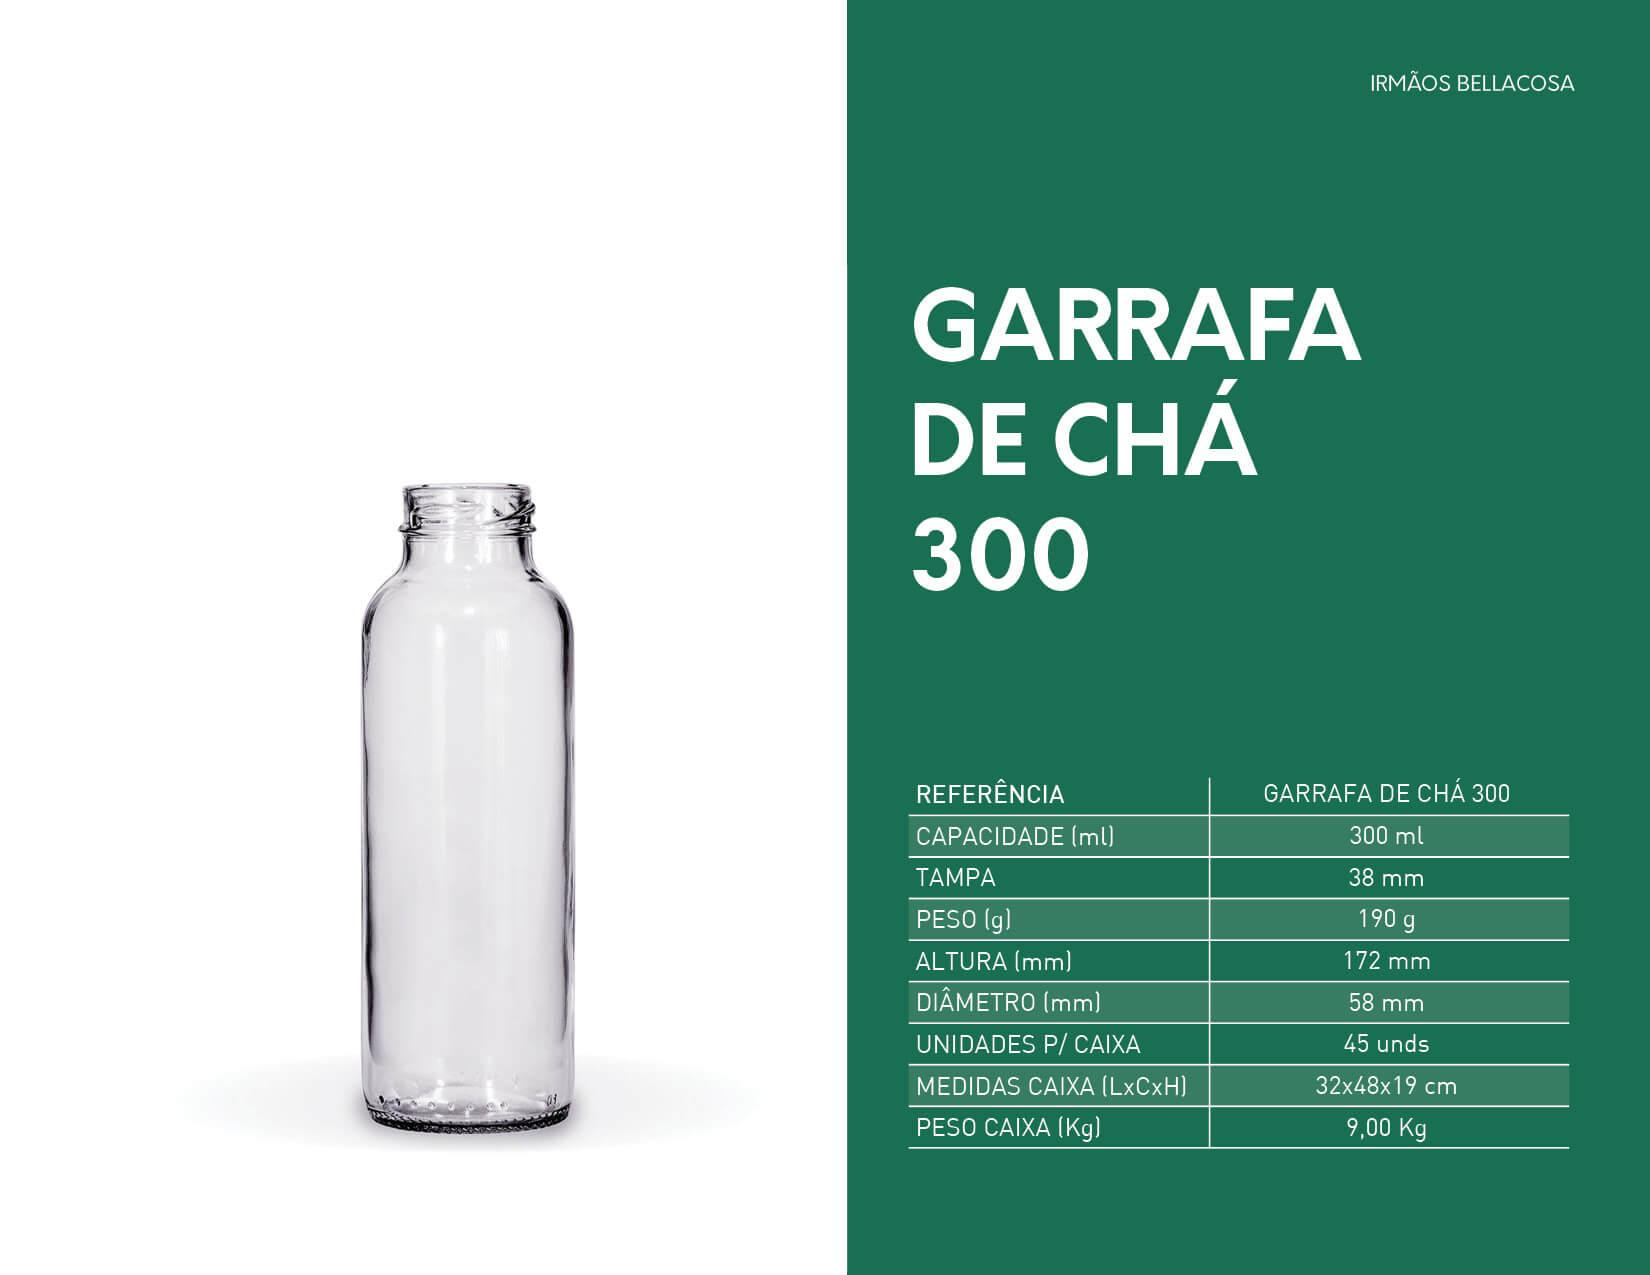 046-Garrafa-de-cha-300-irmaos-bellacosa-embalagens-de-vidro